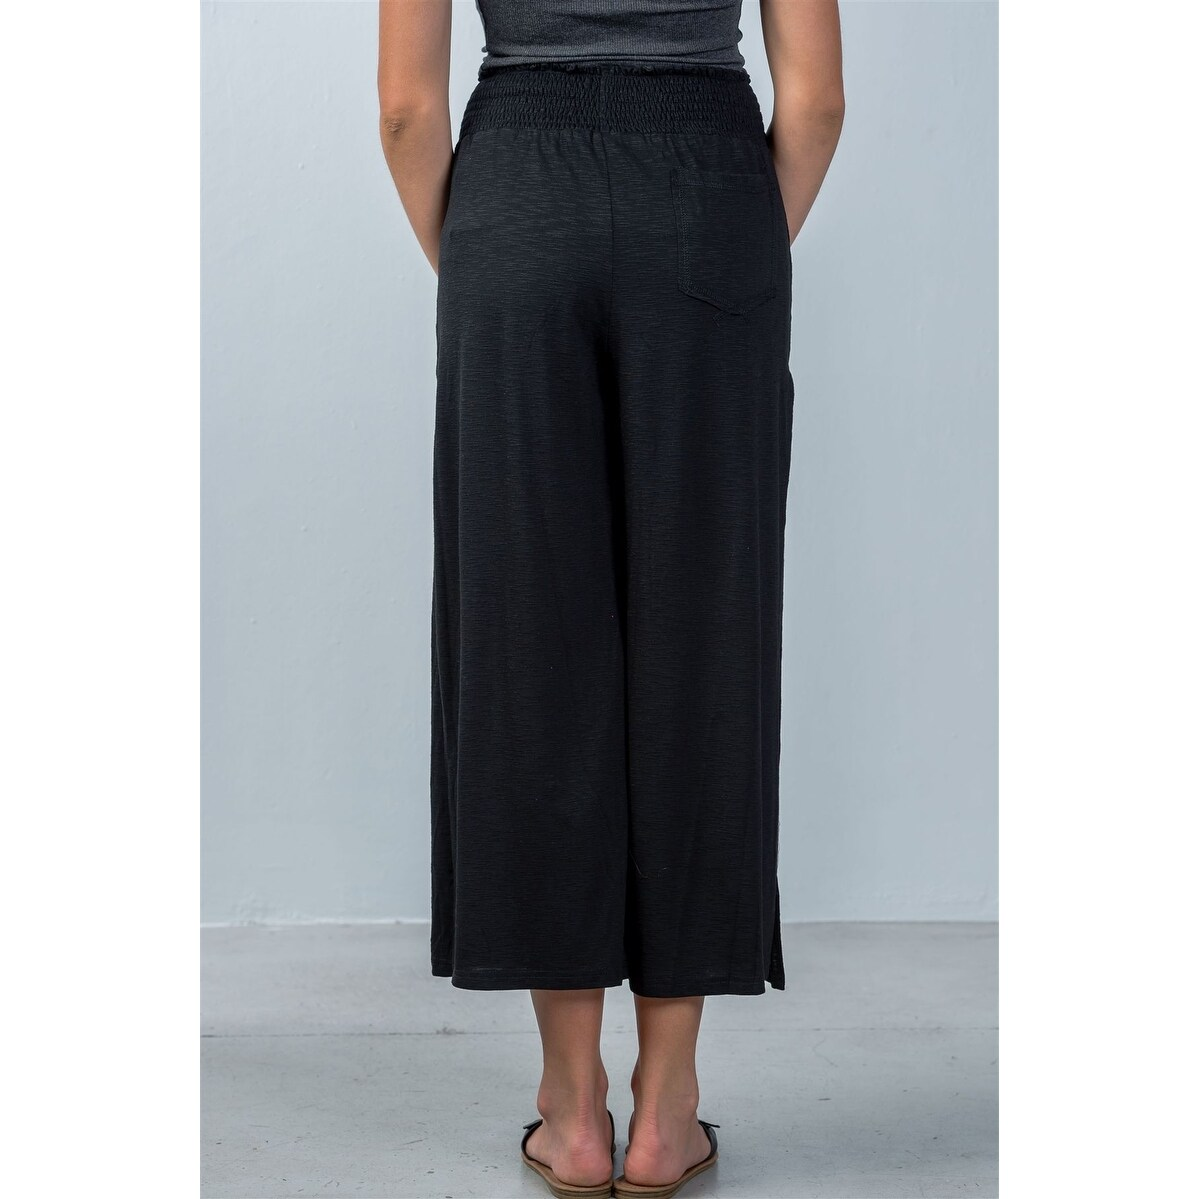 048b35fe042f1 Shop Ladies Fashion Elastic Waistband Side Slit Cropped Pants - Size ...